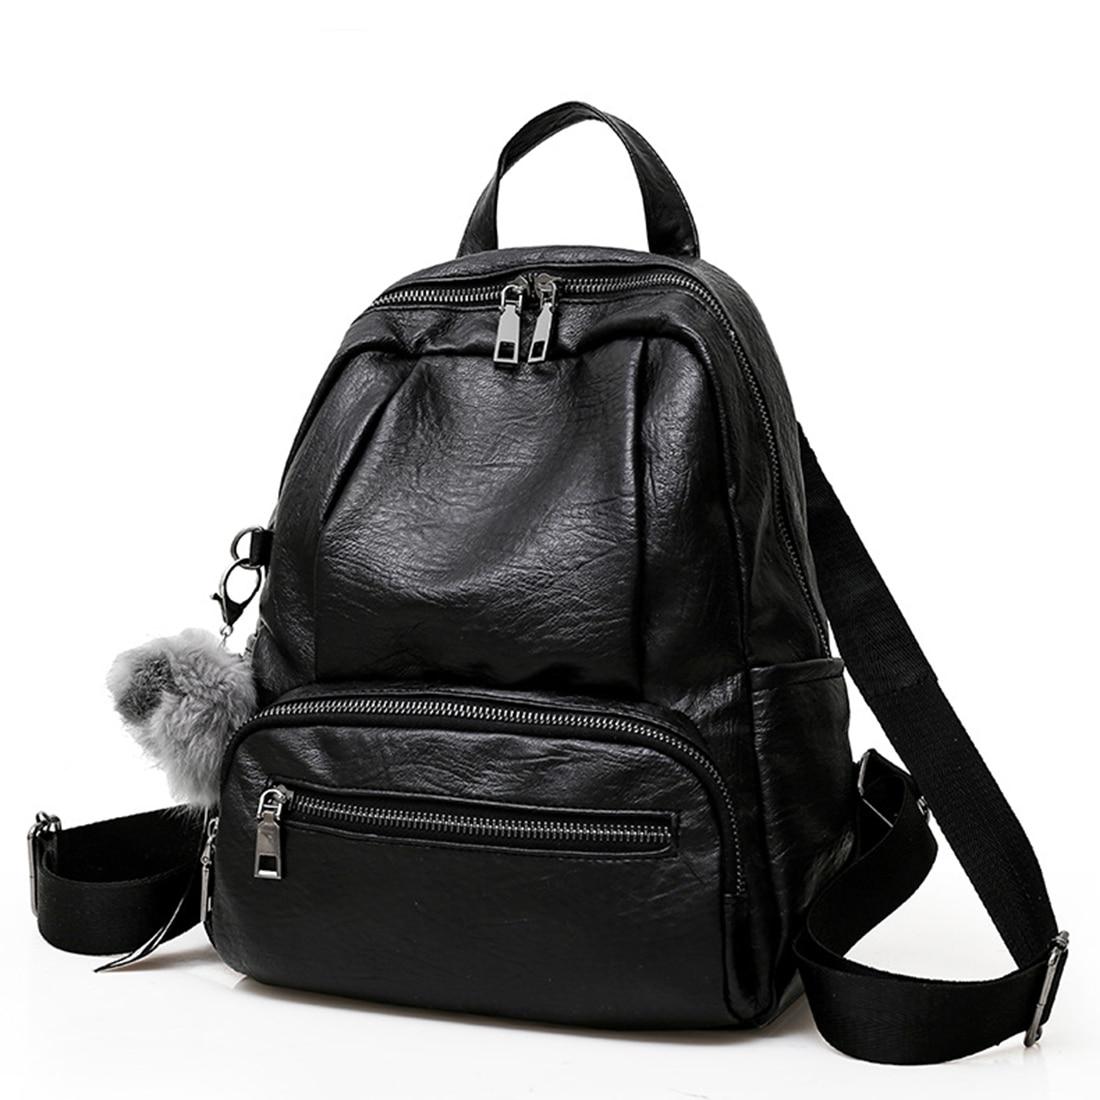 где купить Vintage Women Backpack for Teenage Girls School Bags  2018 Large Backpacks High Quality PU Leather Black Bag Brown backpack по лучшей цене